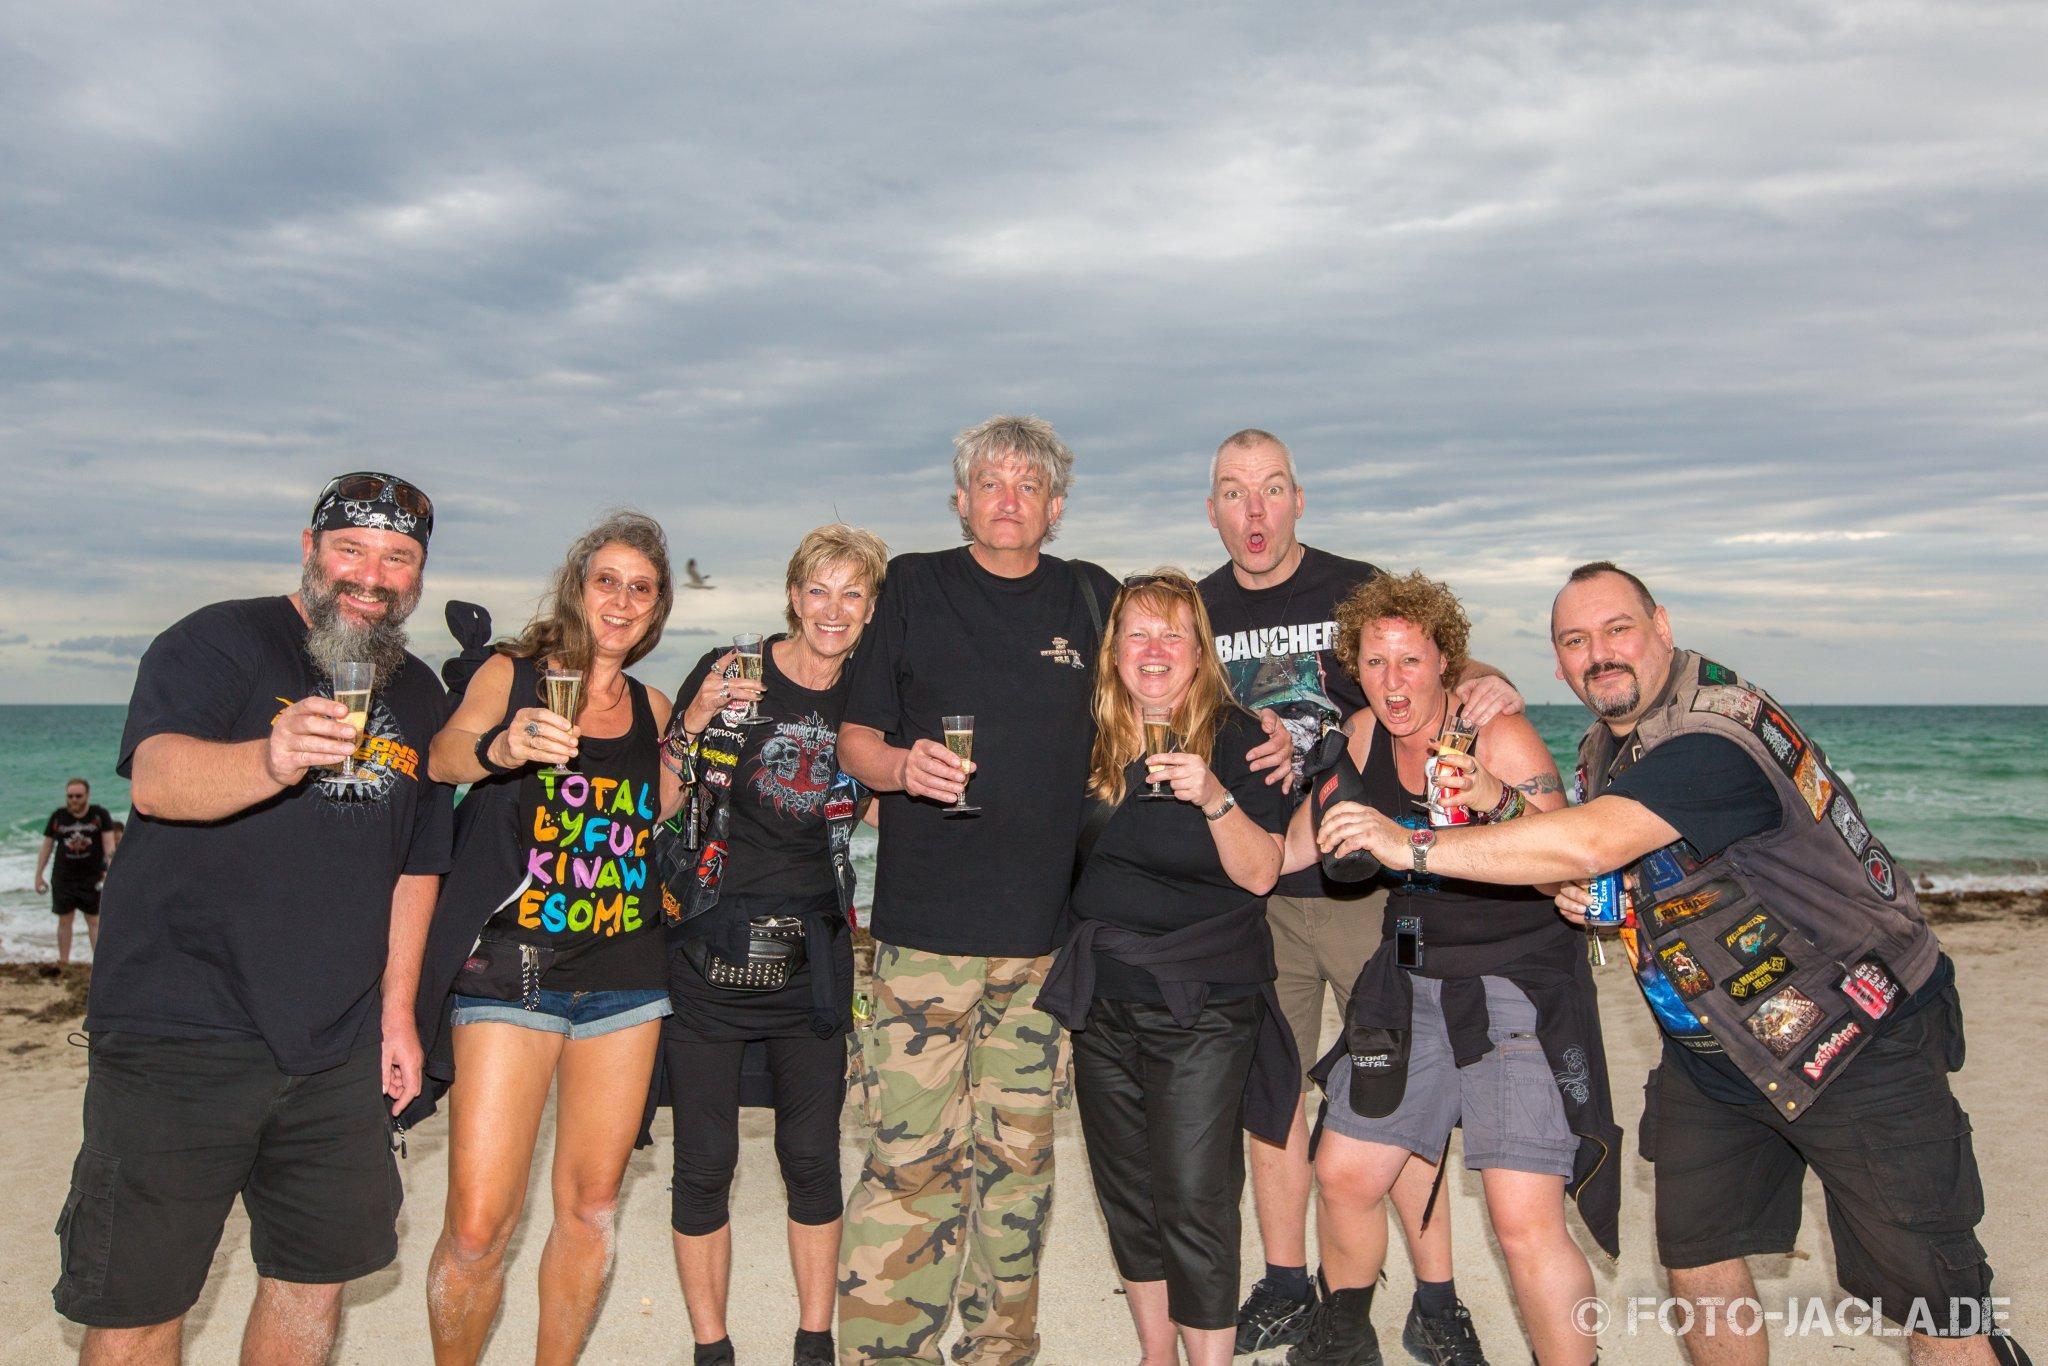 70000 Tons of Metal 2015 ::. Beachparty @ South Beach, Miami